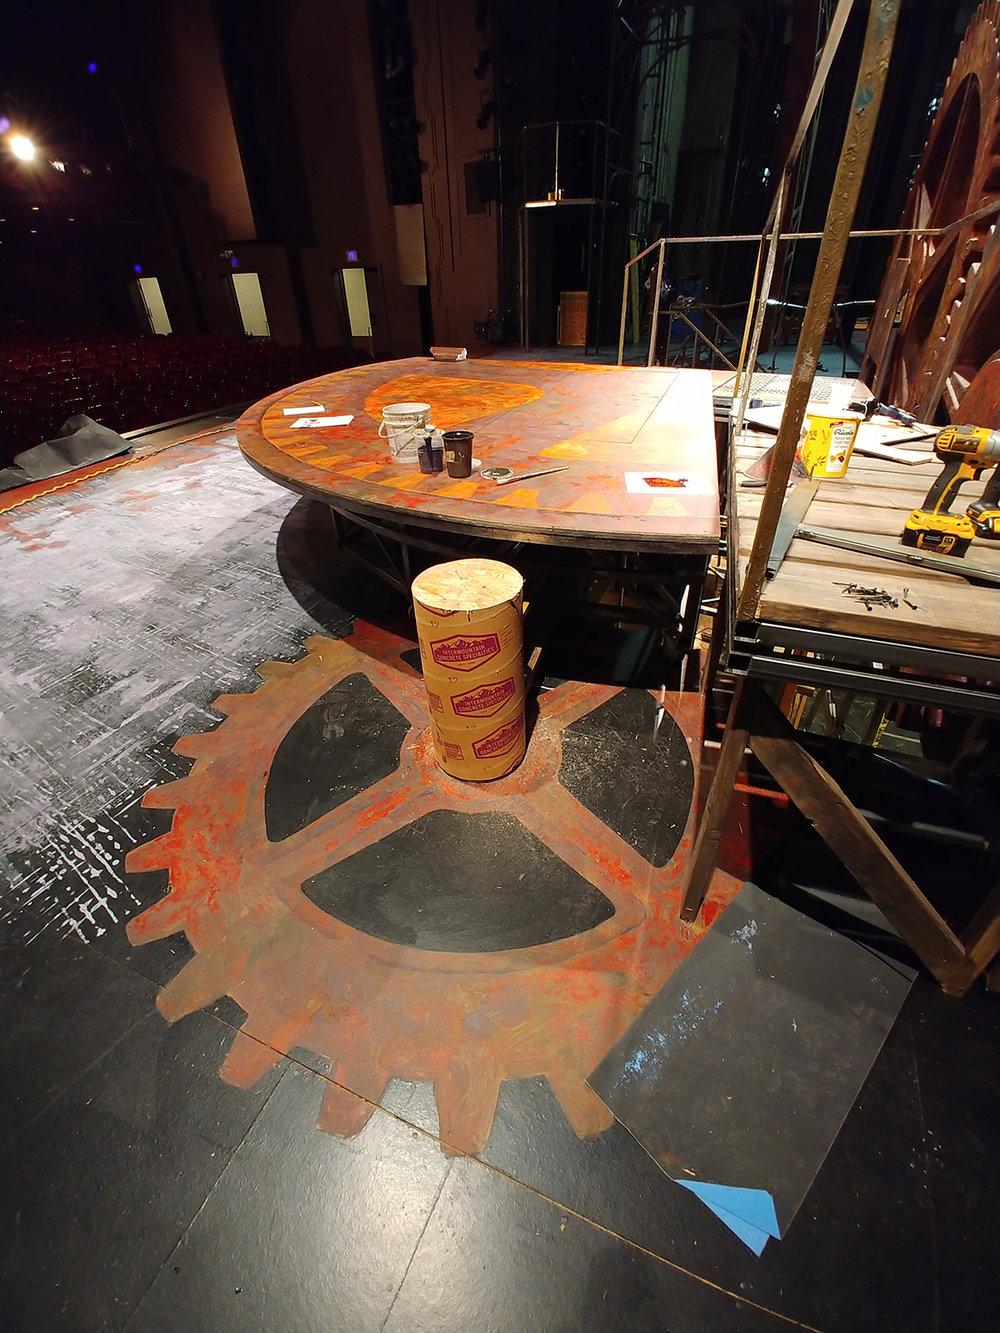 Gear Platform and Gear on Floor